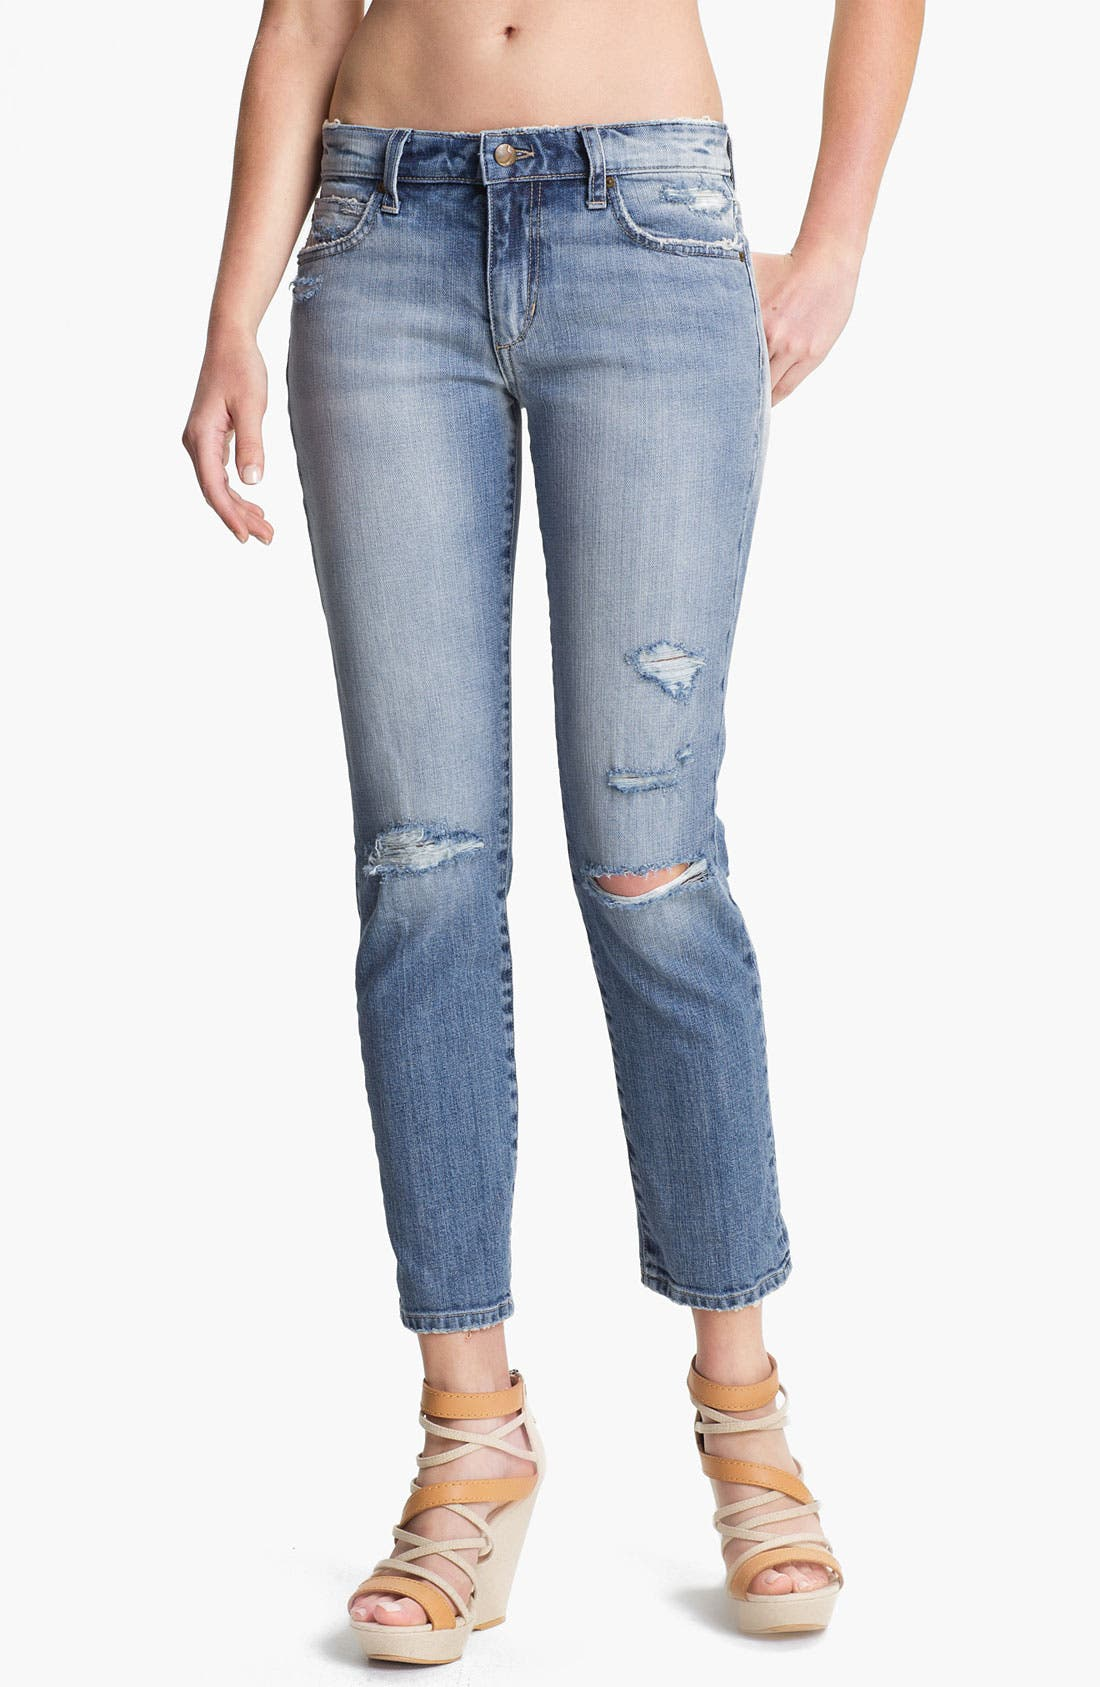 Alternate Image 1 Selected - Joe's 'High Water' Relaxed Crop Jeans (Keri Vintage Reserve)